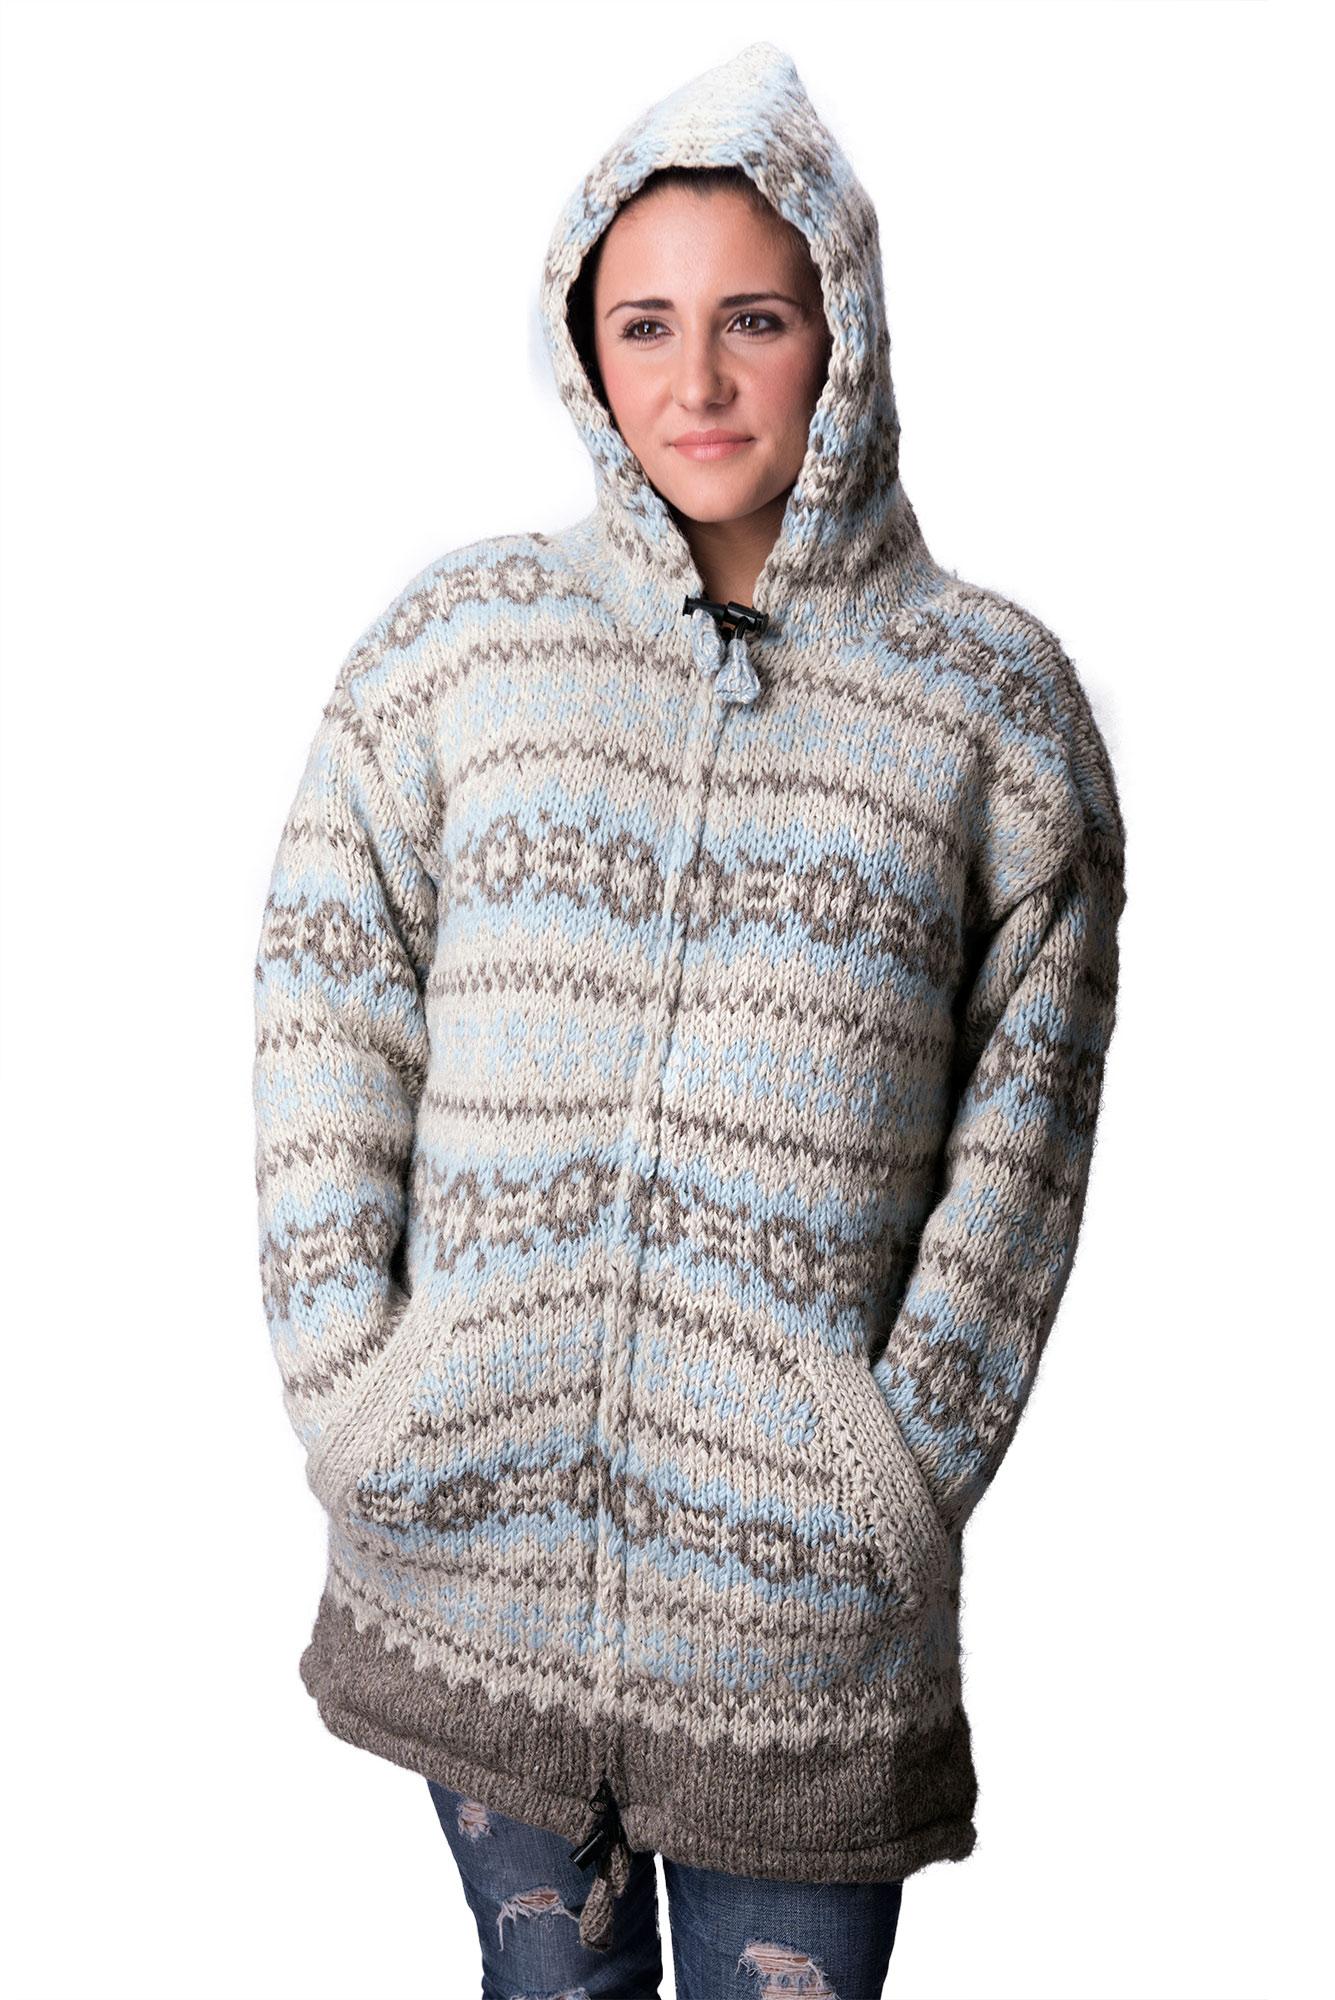 Wool Vintage Himalayan Mountain Jacket – Long Length Baby Blue & Natural